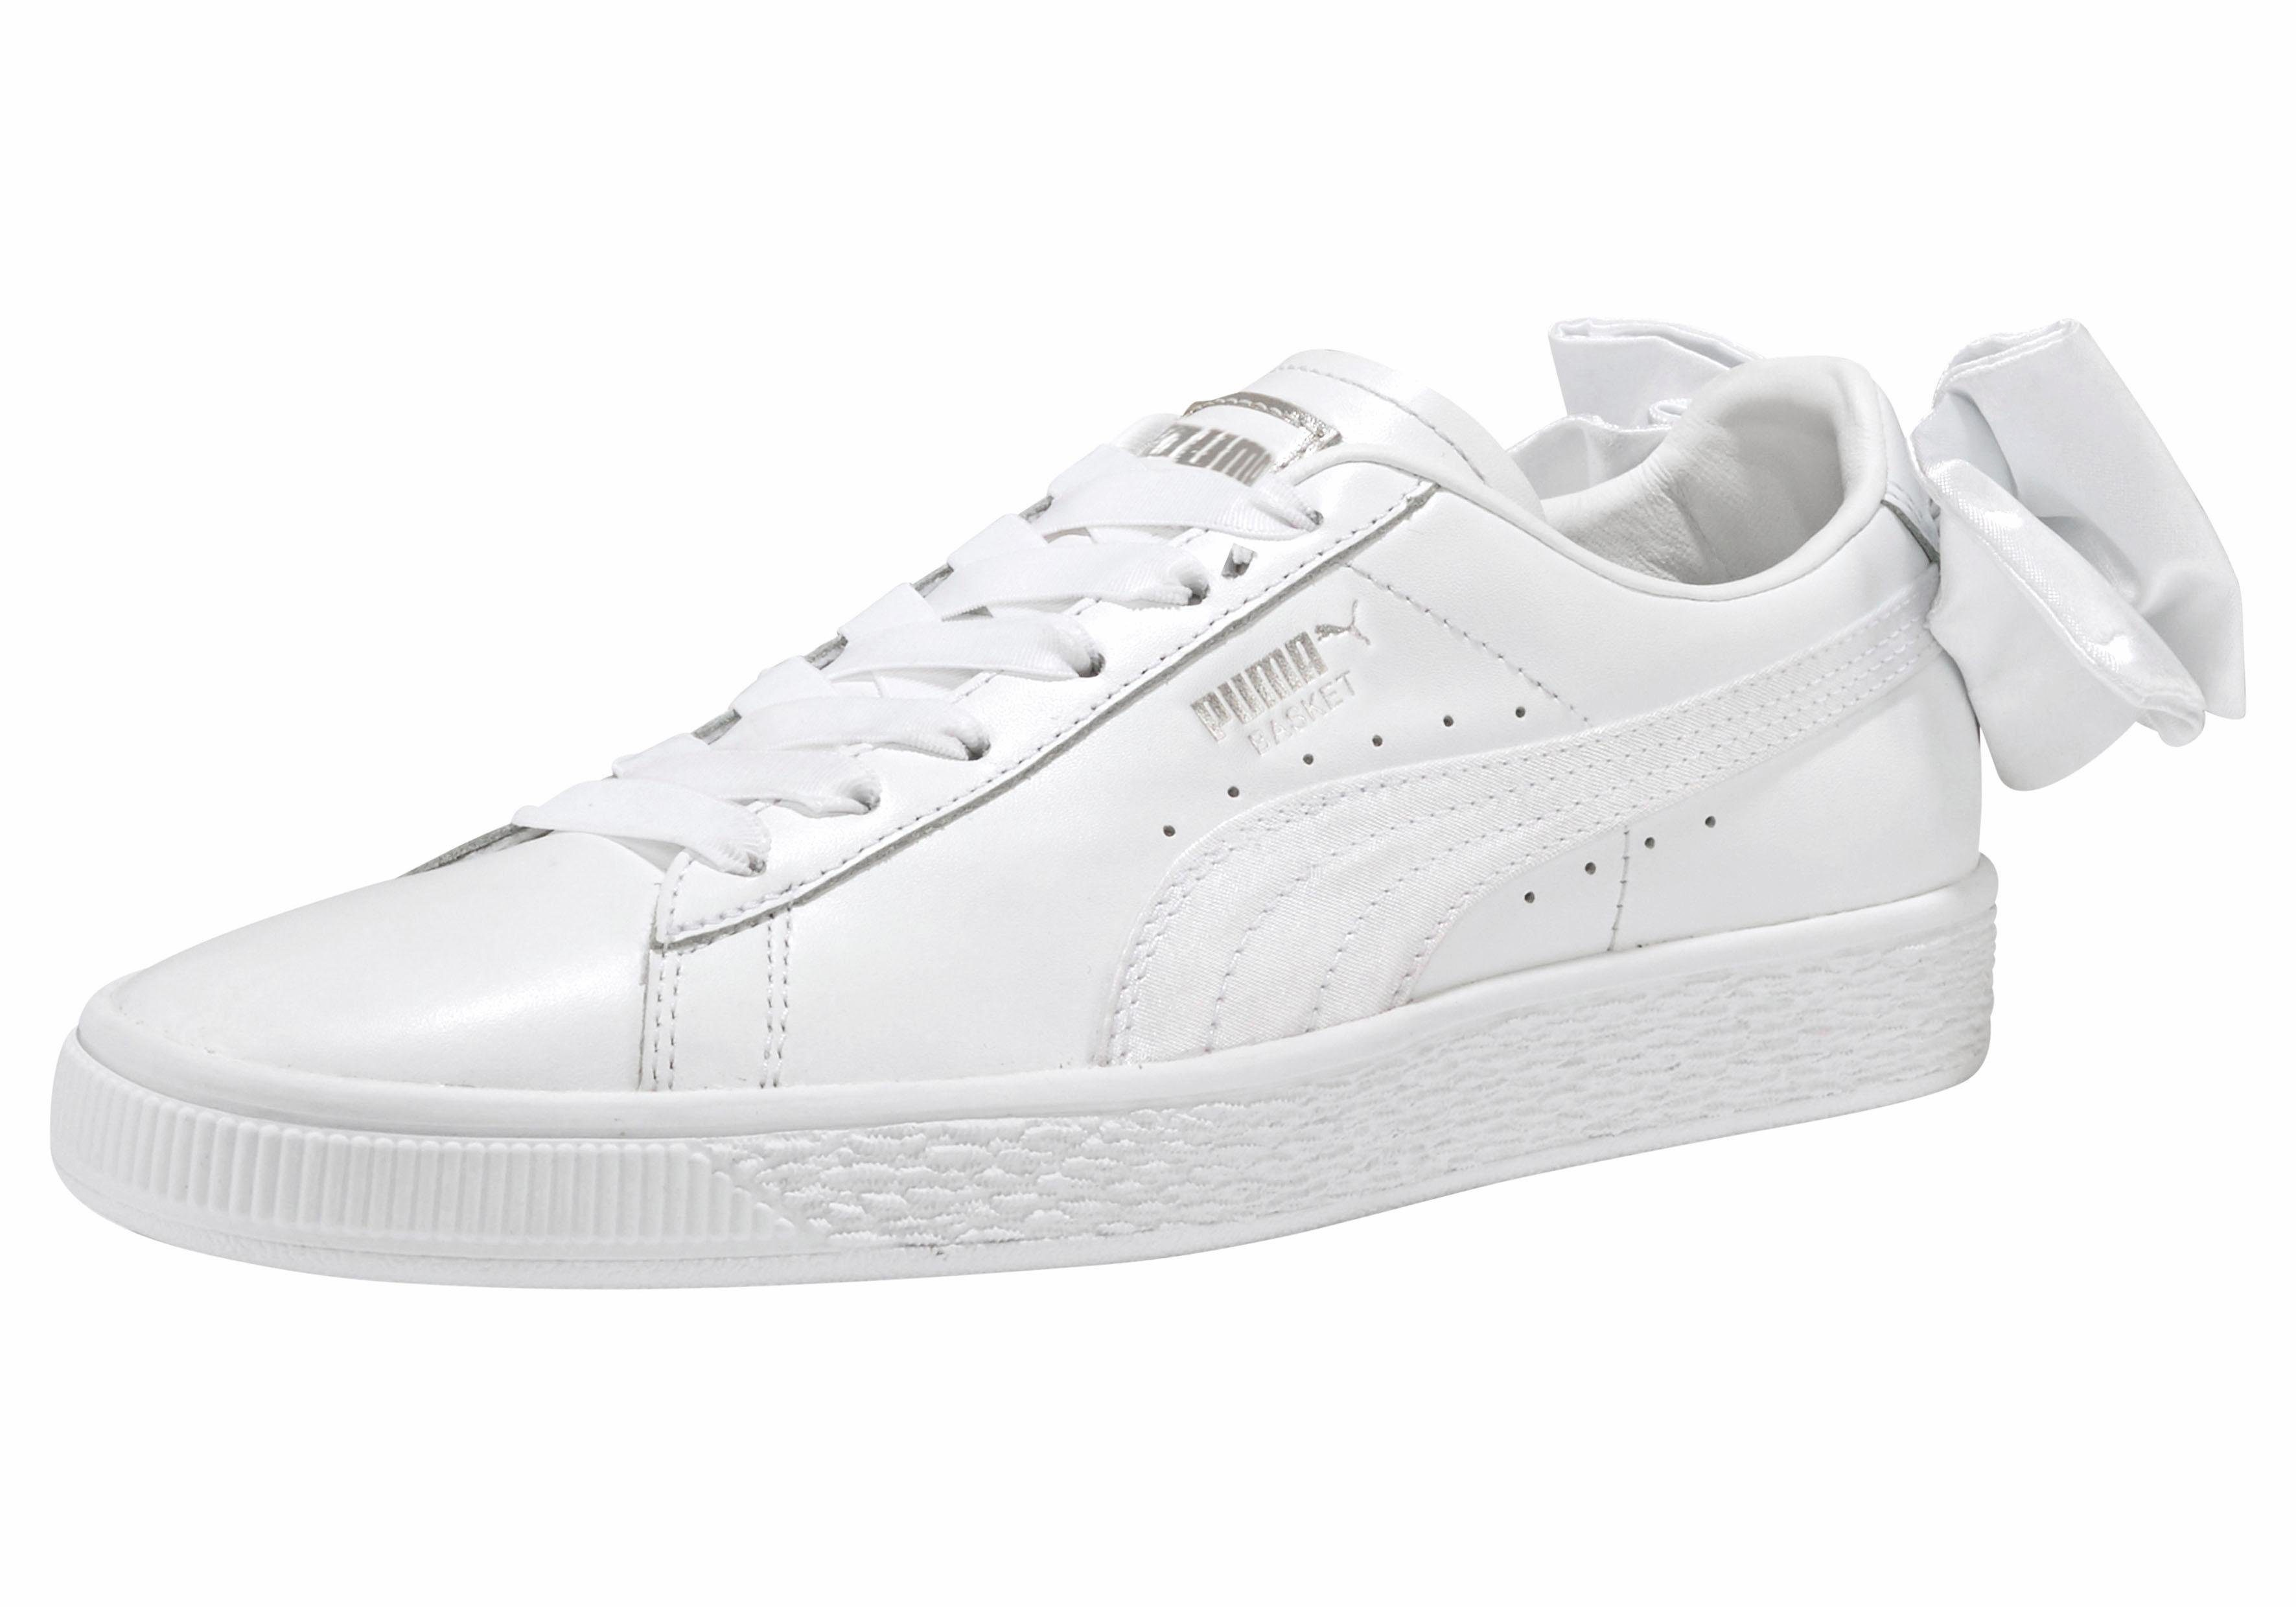 PUMA Basket Bow Sneakers, weißrosa